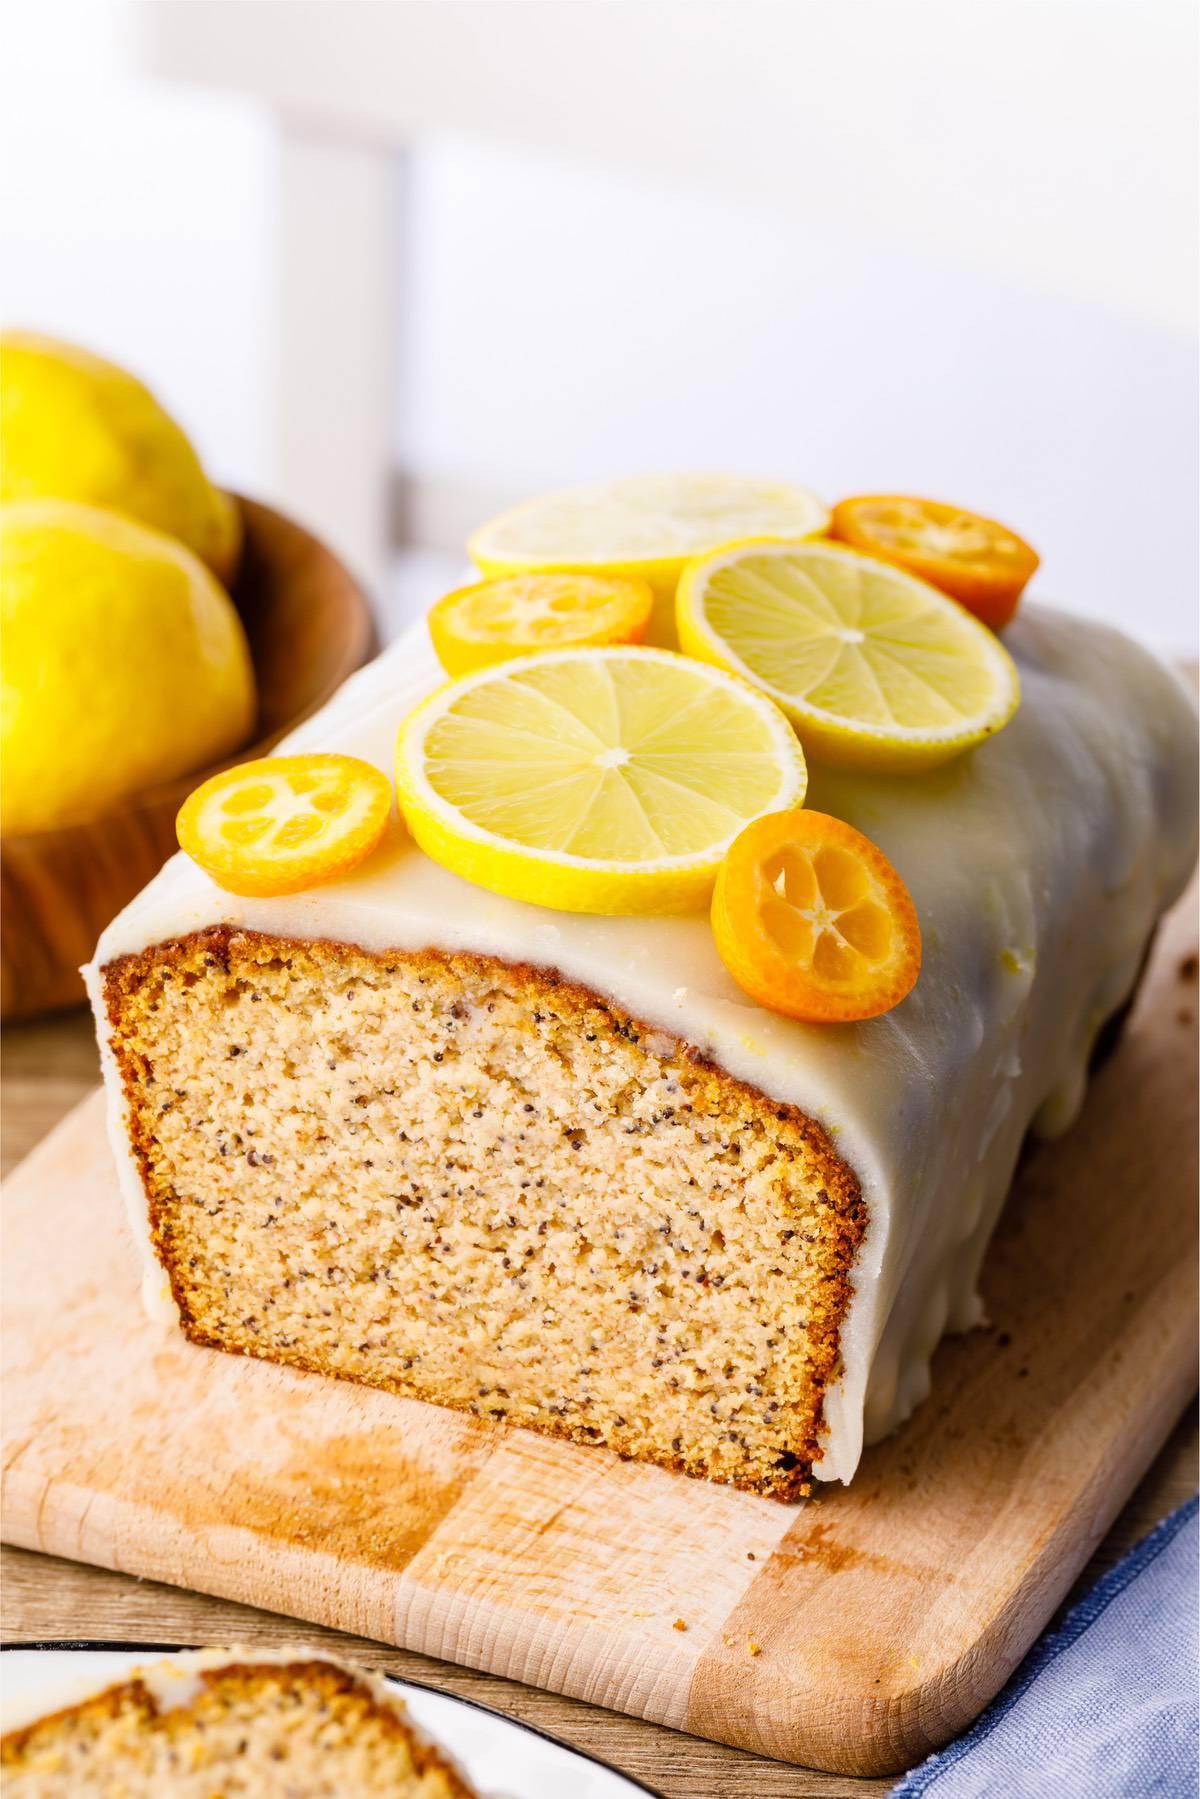 Home.fit lemon-poppy-seed-paleo-bread-5 Lemon Poppy Seed Bread (Low Carb)